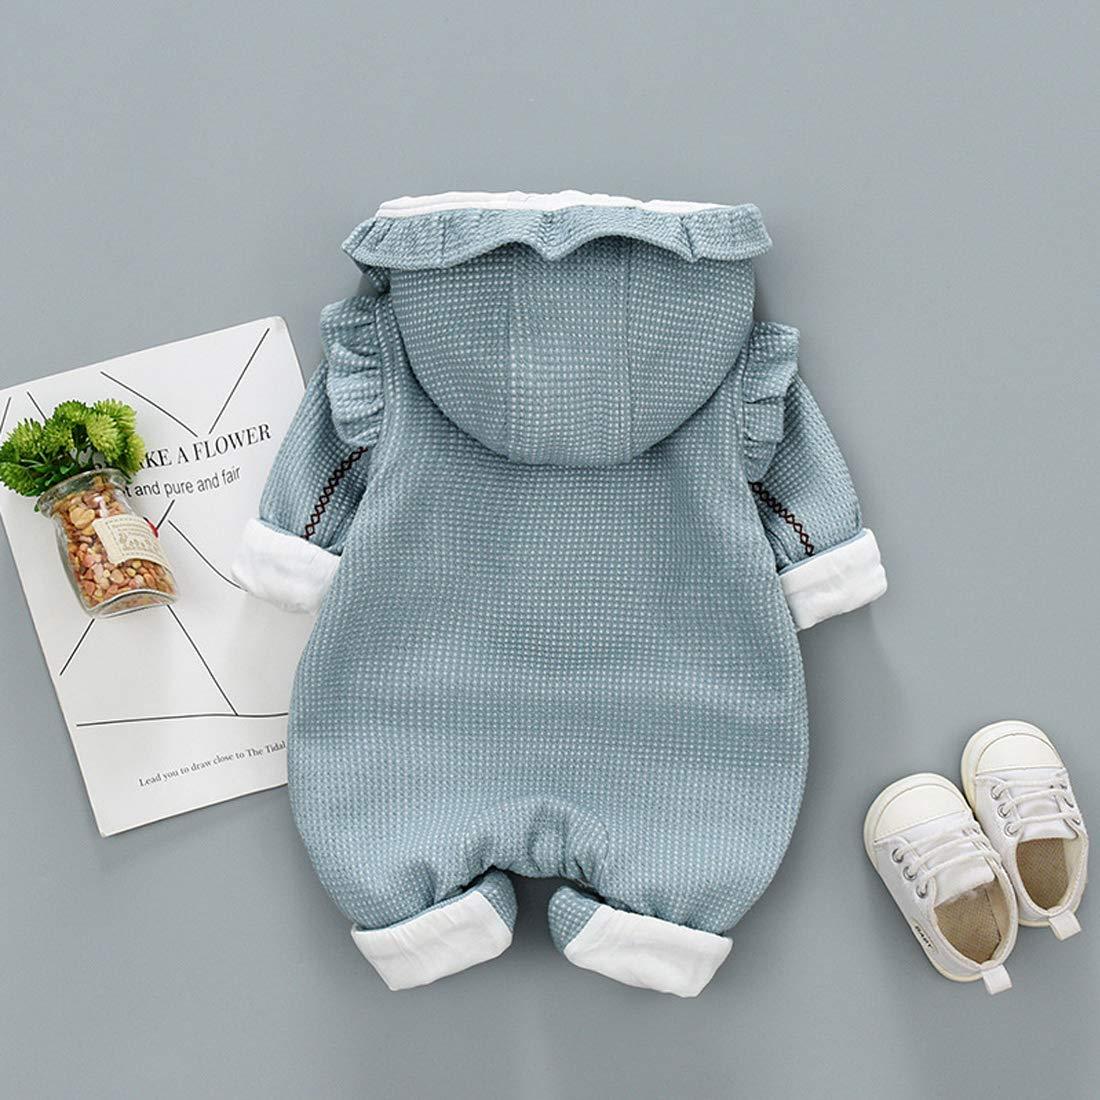 DorkasDE Baby Strampler Neugeborene Kleinkinder Strampleranzug Overall Cartoon Jumpsuit Babykleidung mit Abnehmbar Kapuze